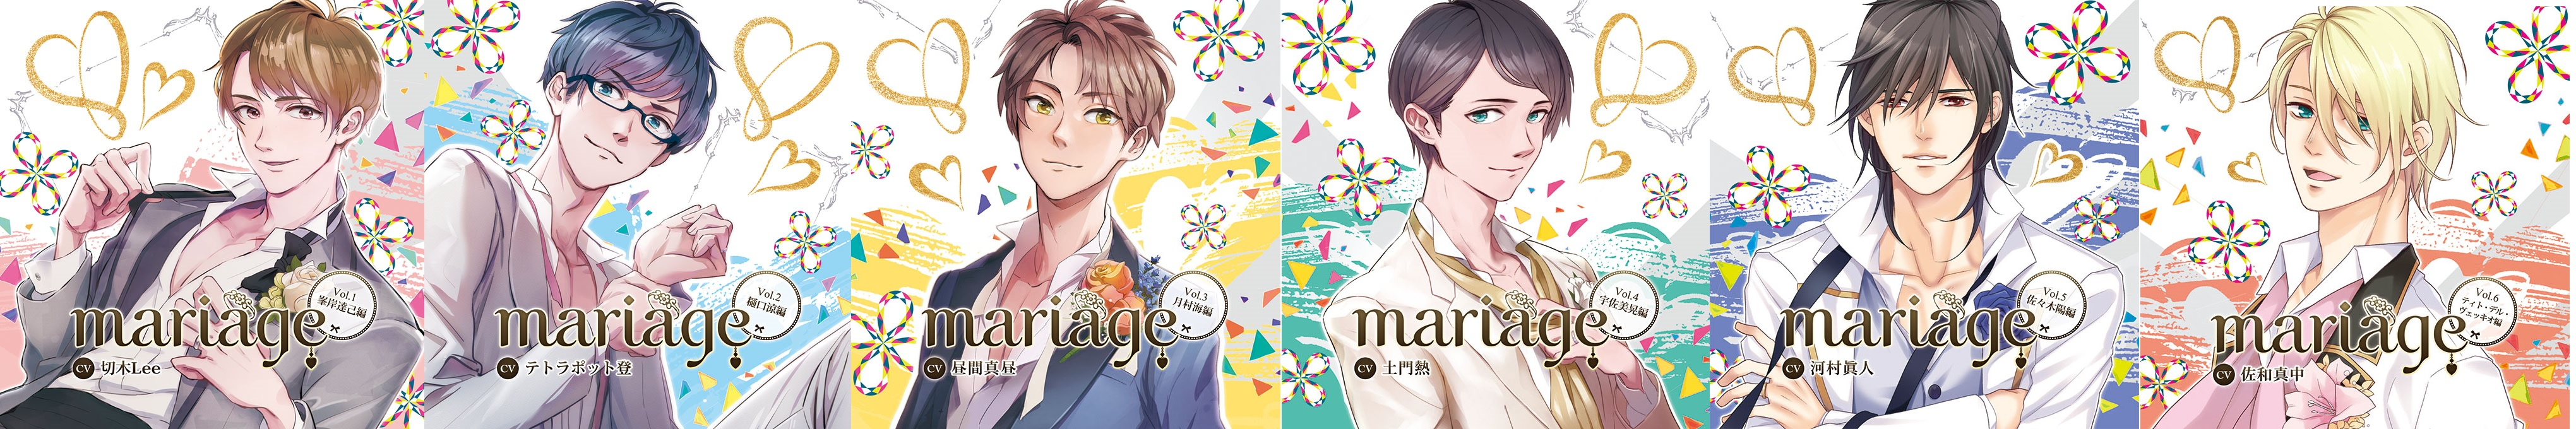 mariage_mens.jpg